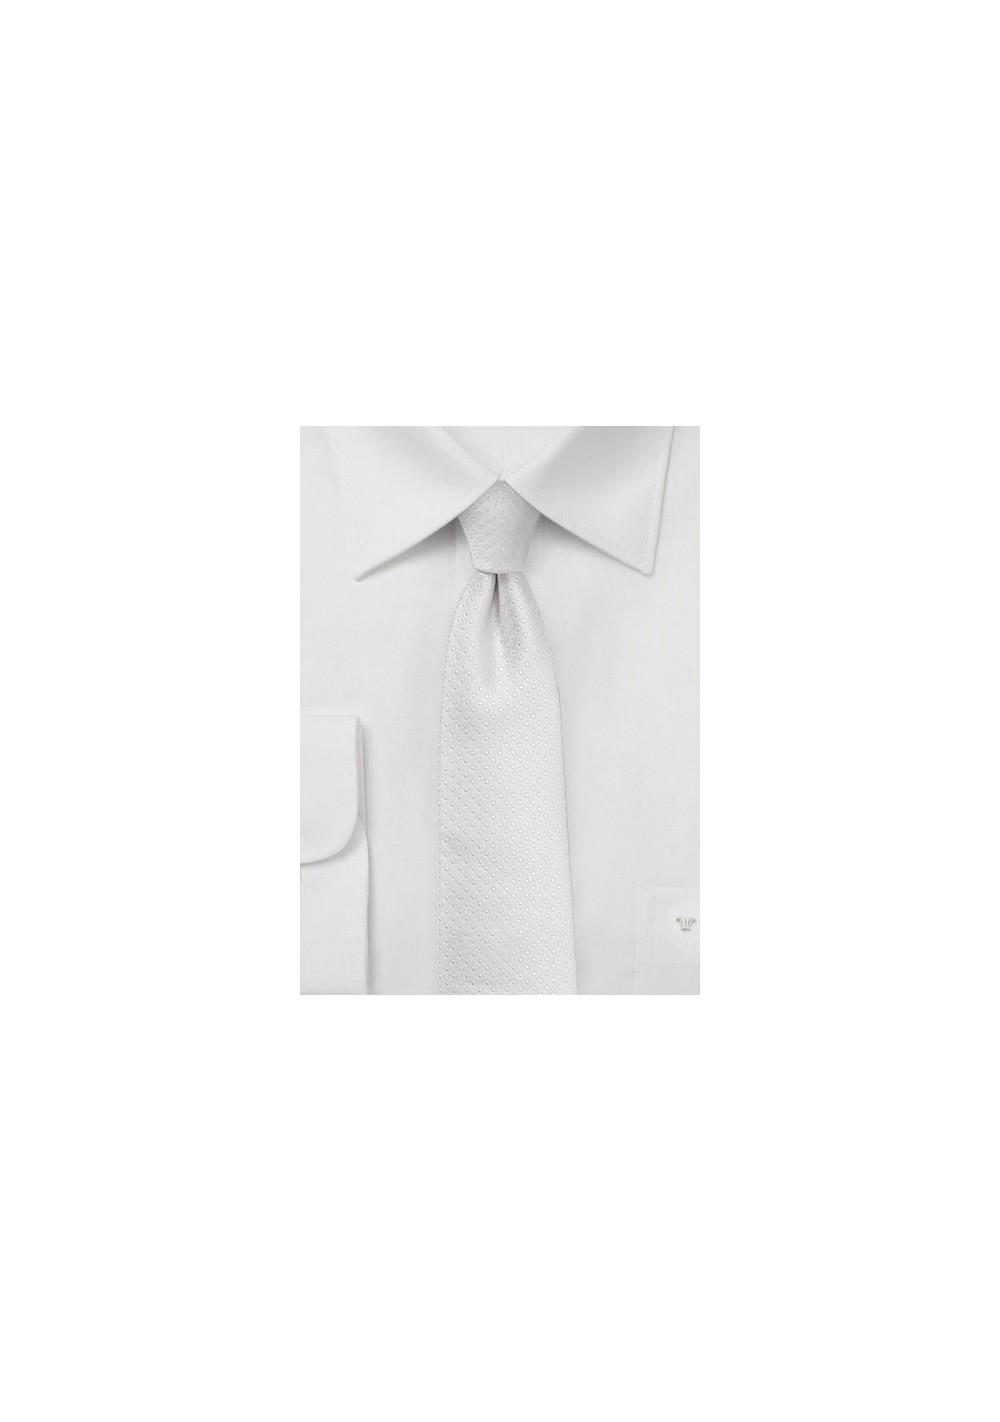 Pin Dot Tie in Formal Ivory